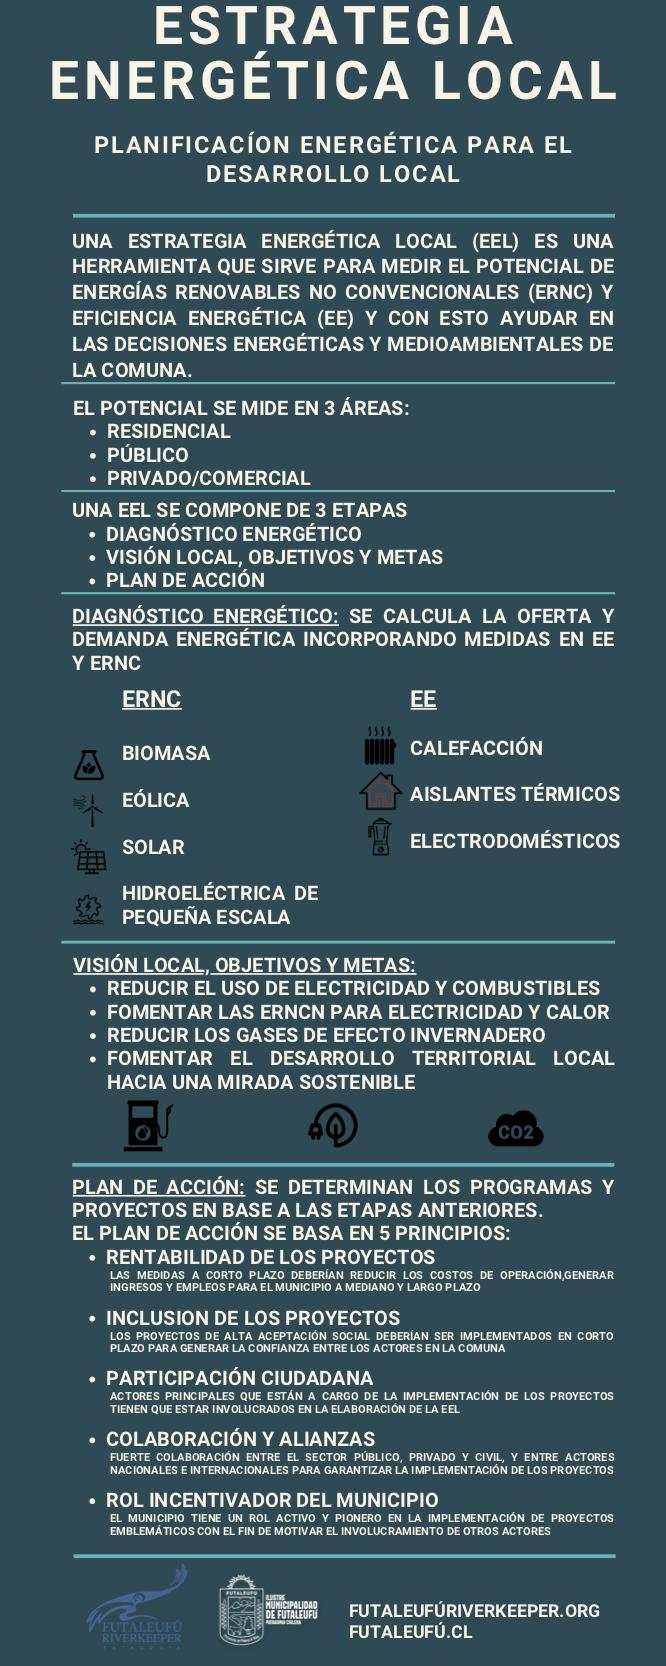 Estrategia Energética Local